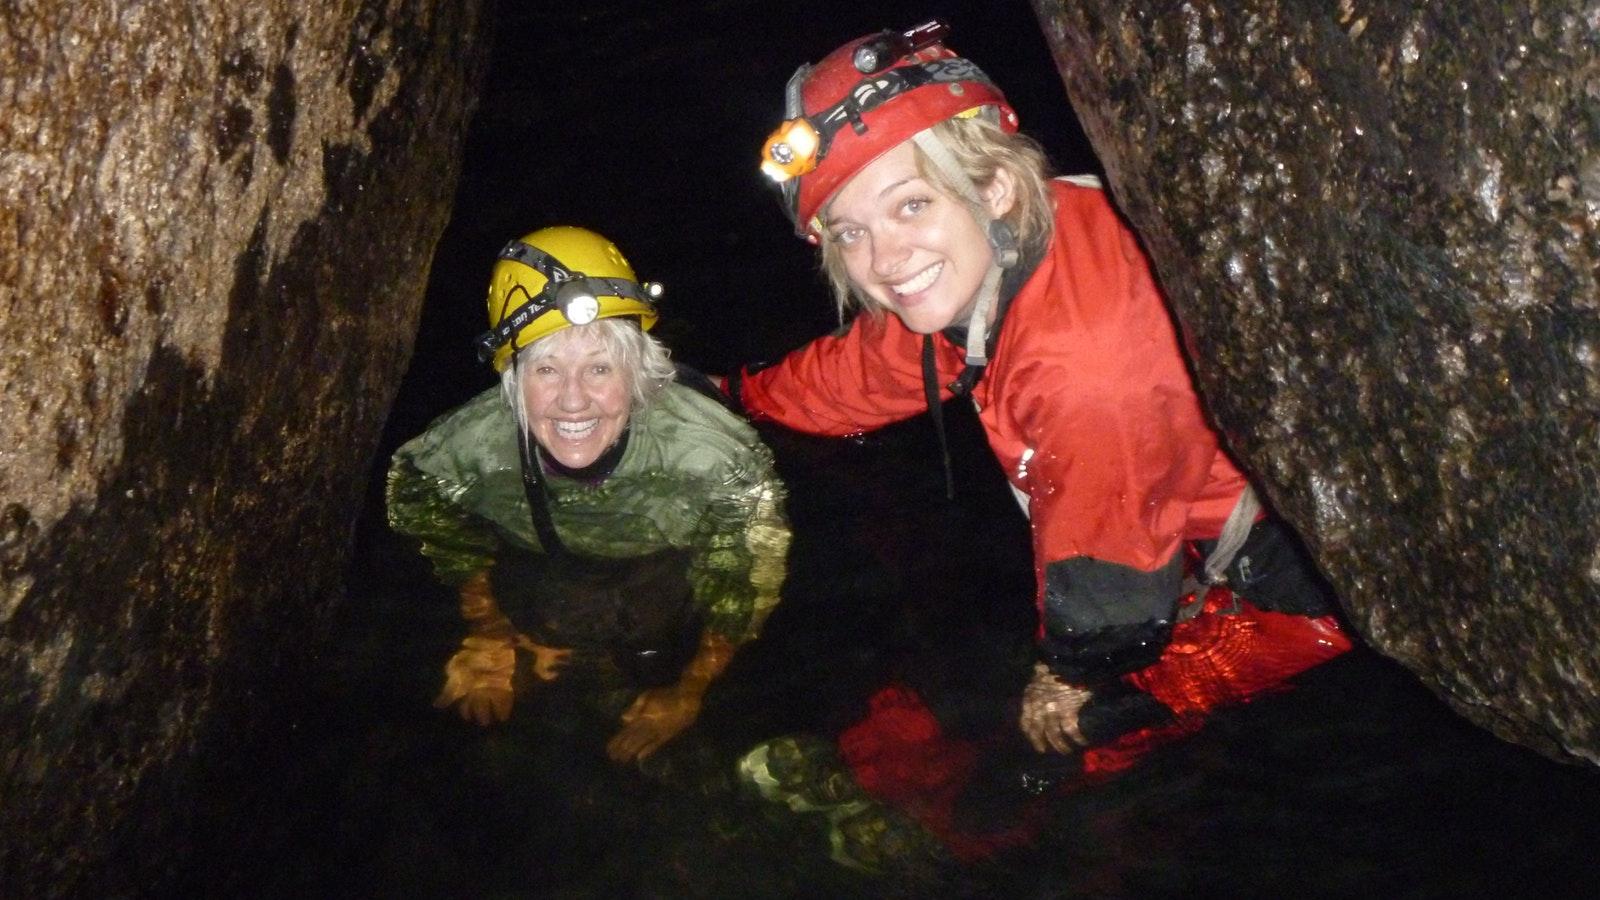 Underground River Caving Mt Buffao